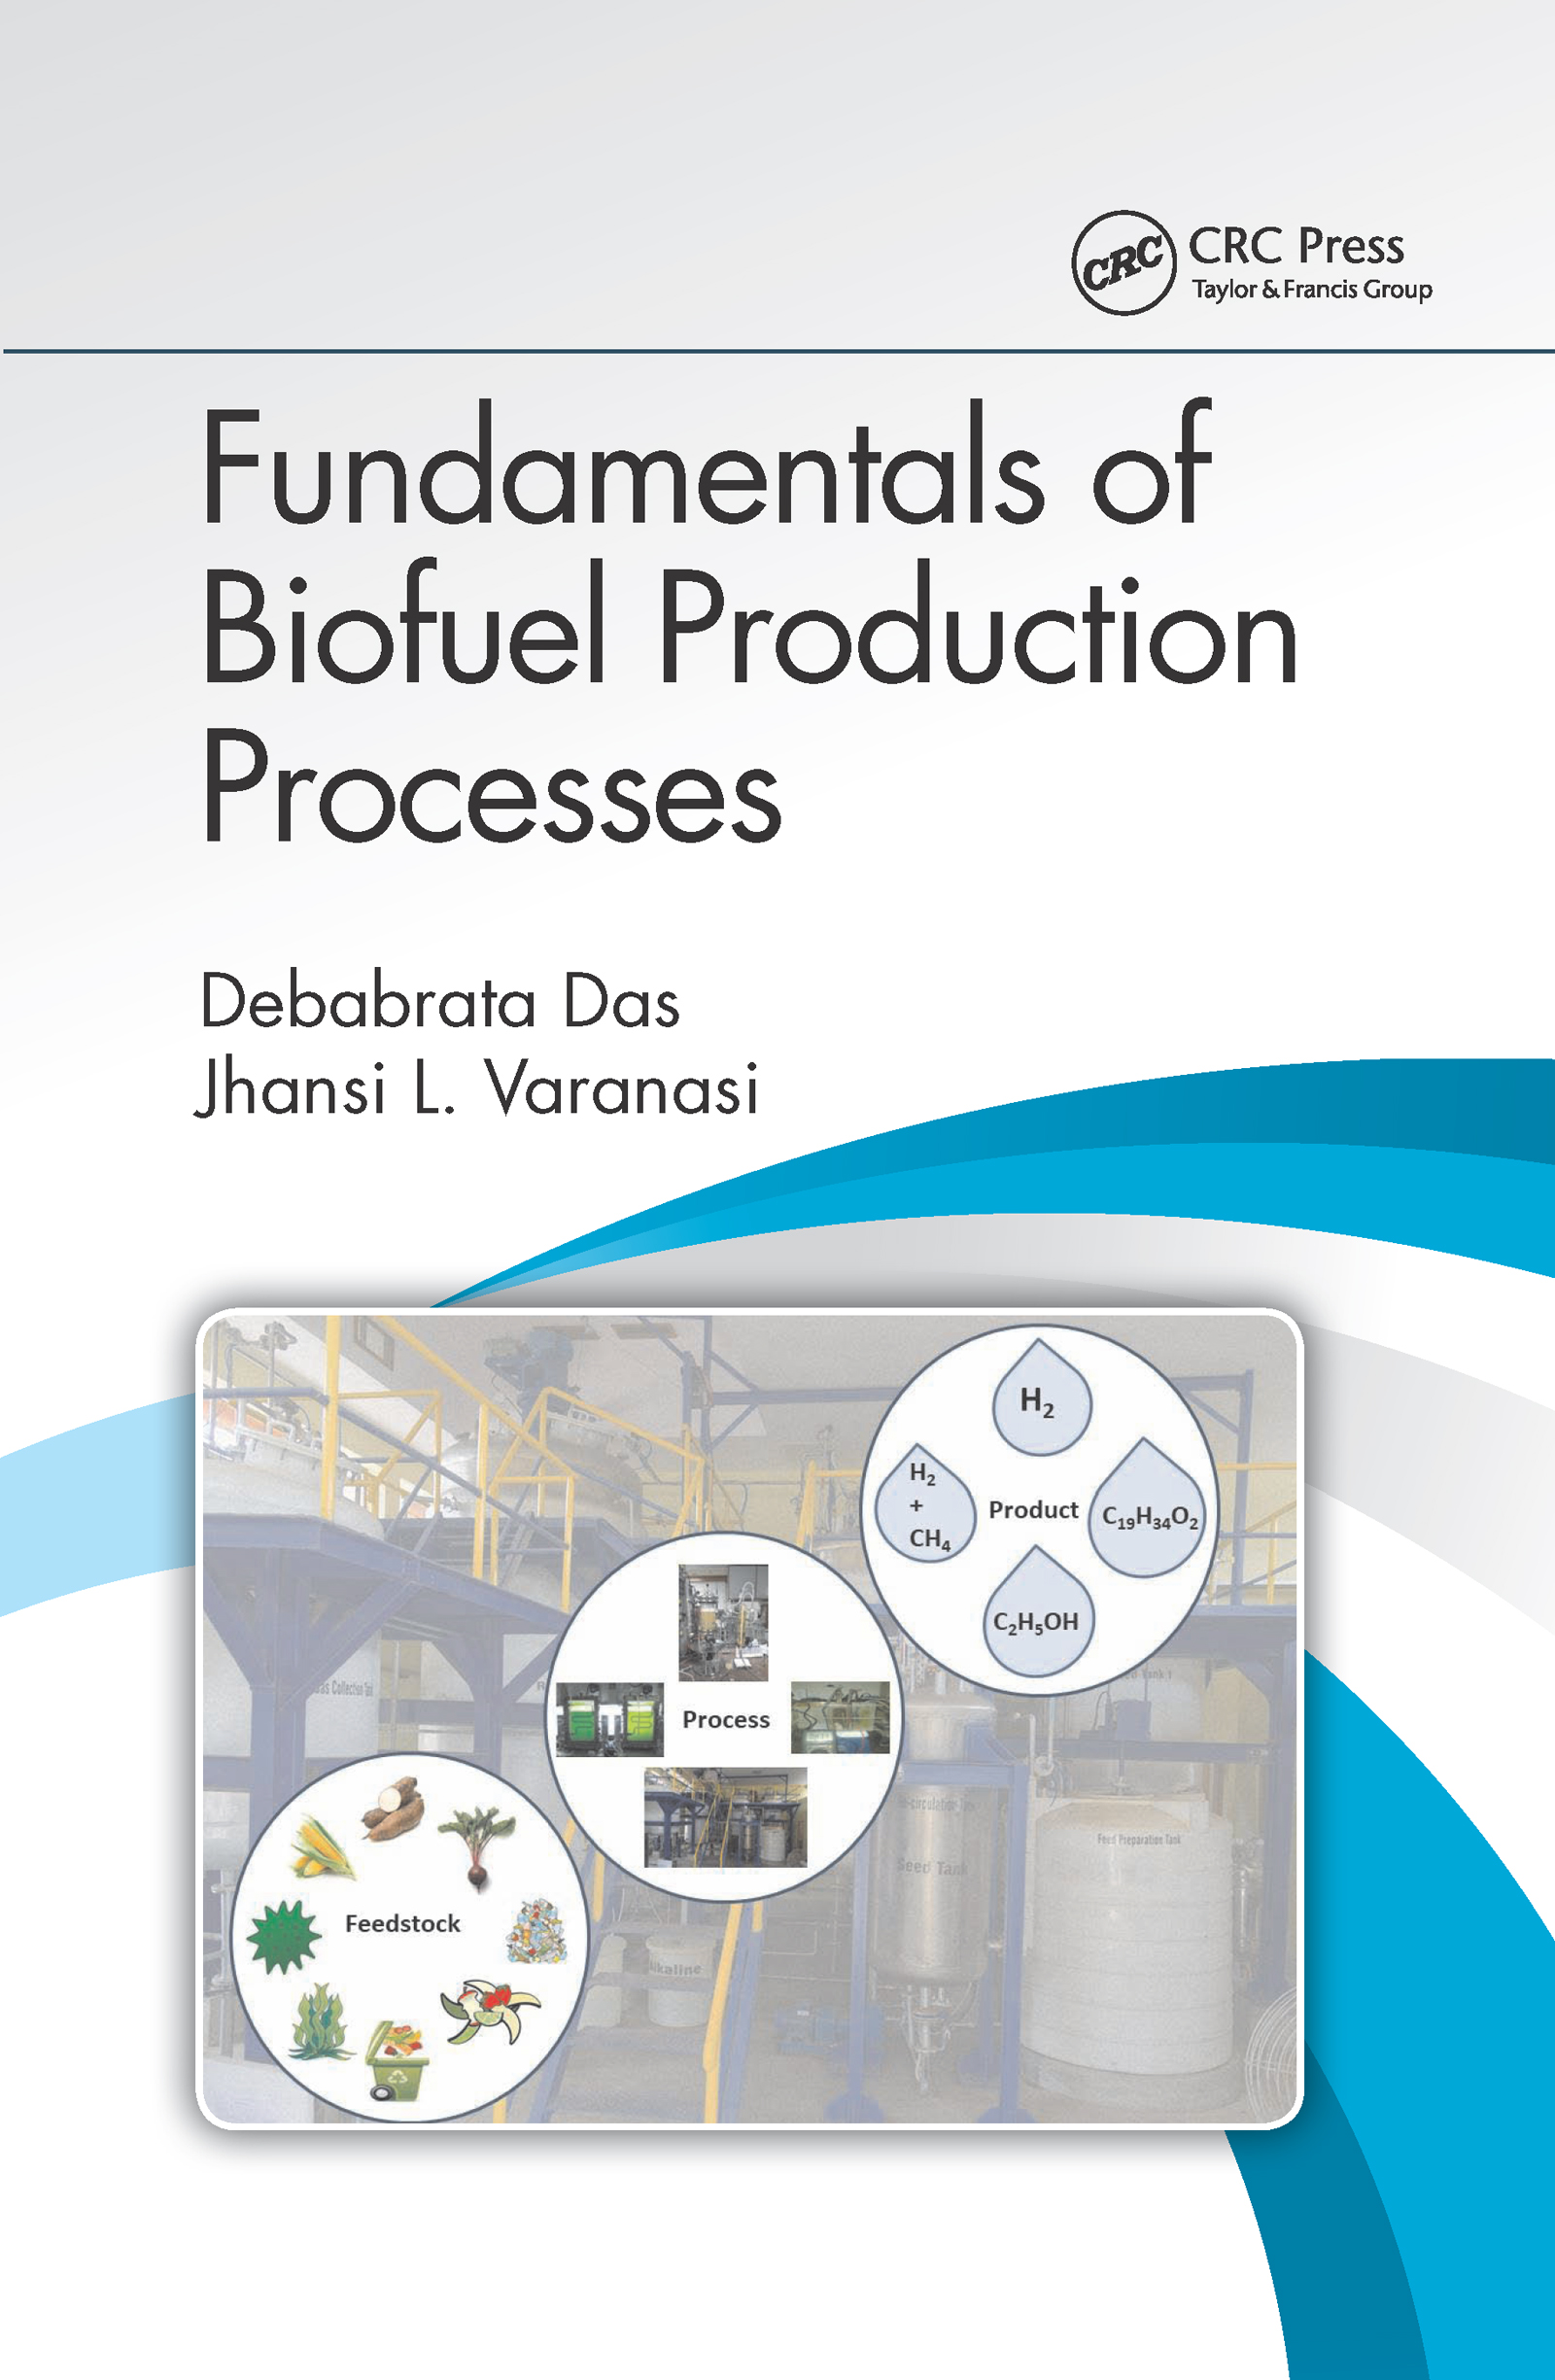 Fundamentals of Biofuel Production Processes